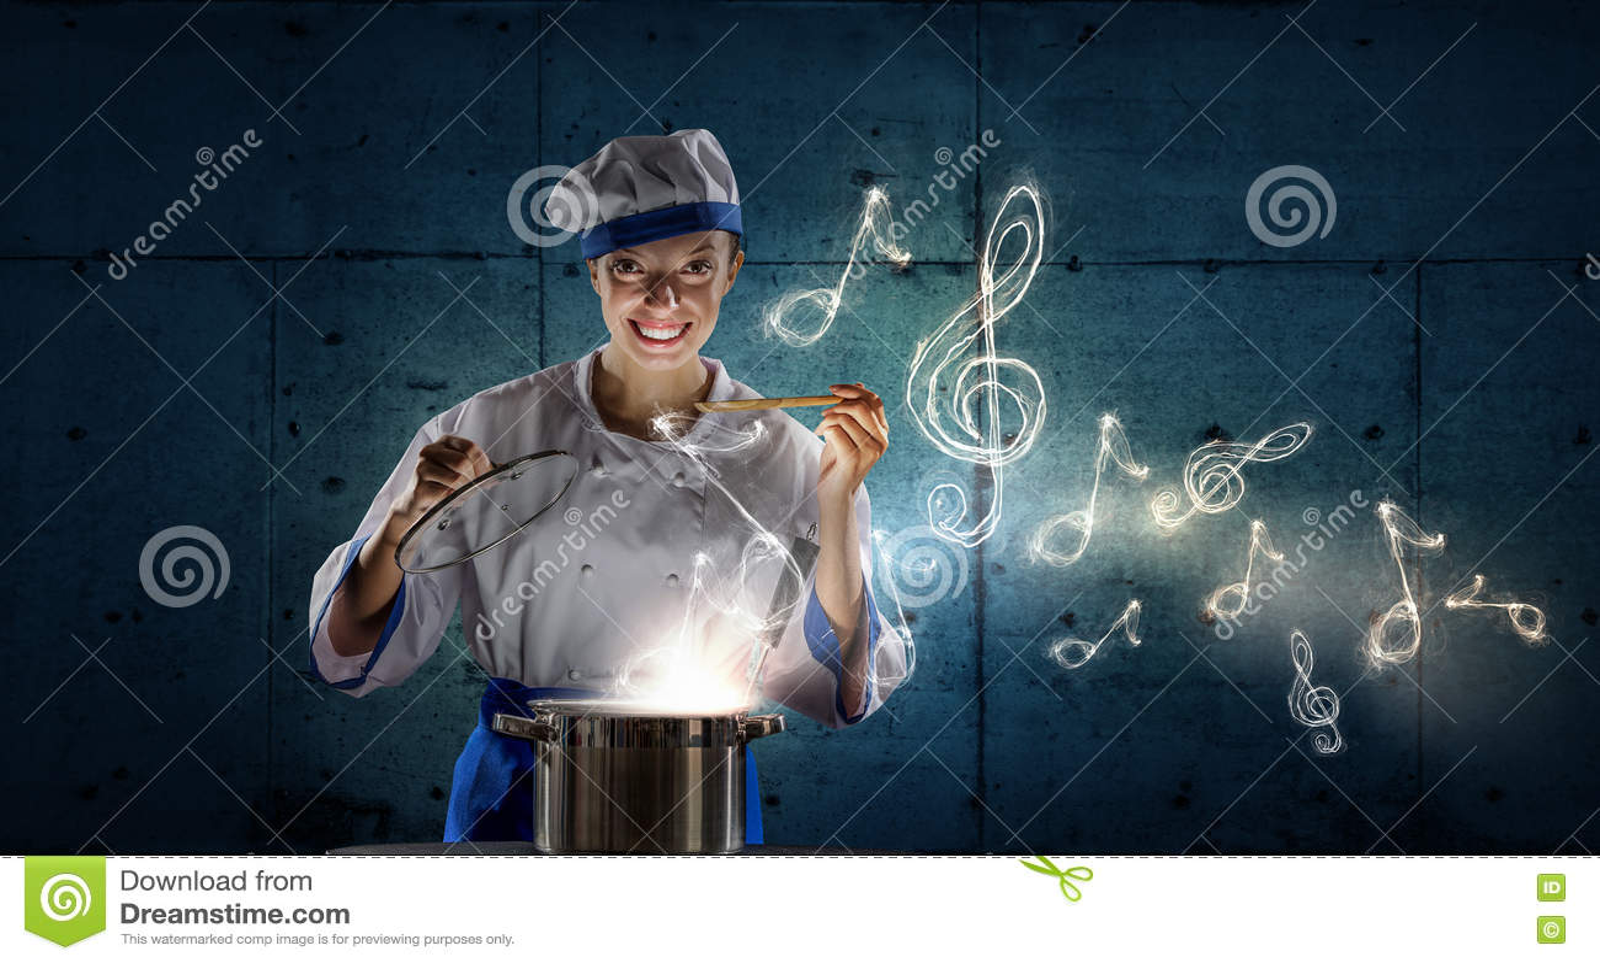 kitchen magician sinks for kitchens 她是魔术师作为厨师库存照片 图片包括有厨房 主妇 午餐 曲调 查找 她是魔术师作为厨师